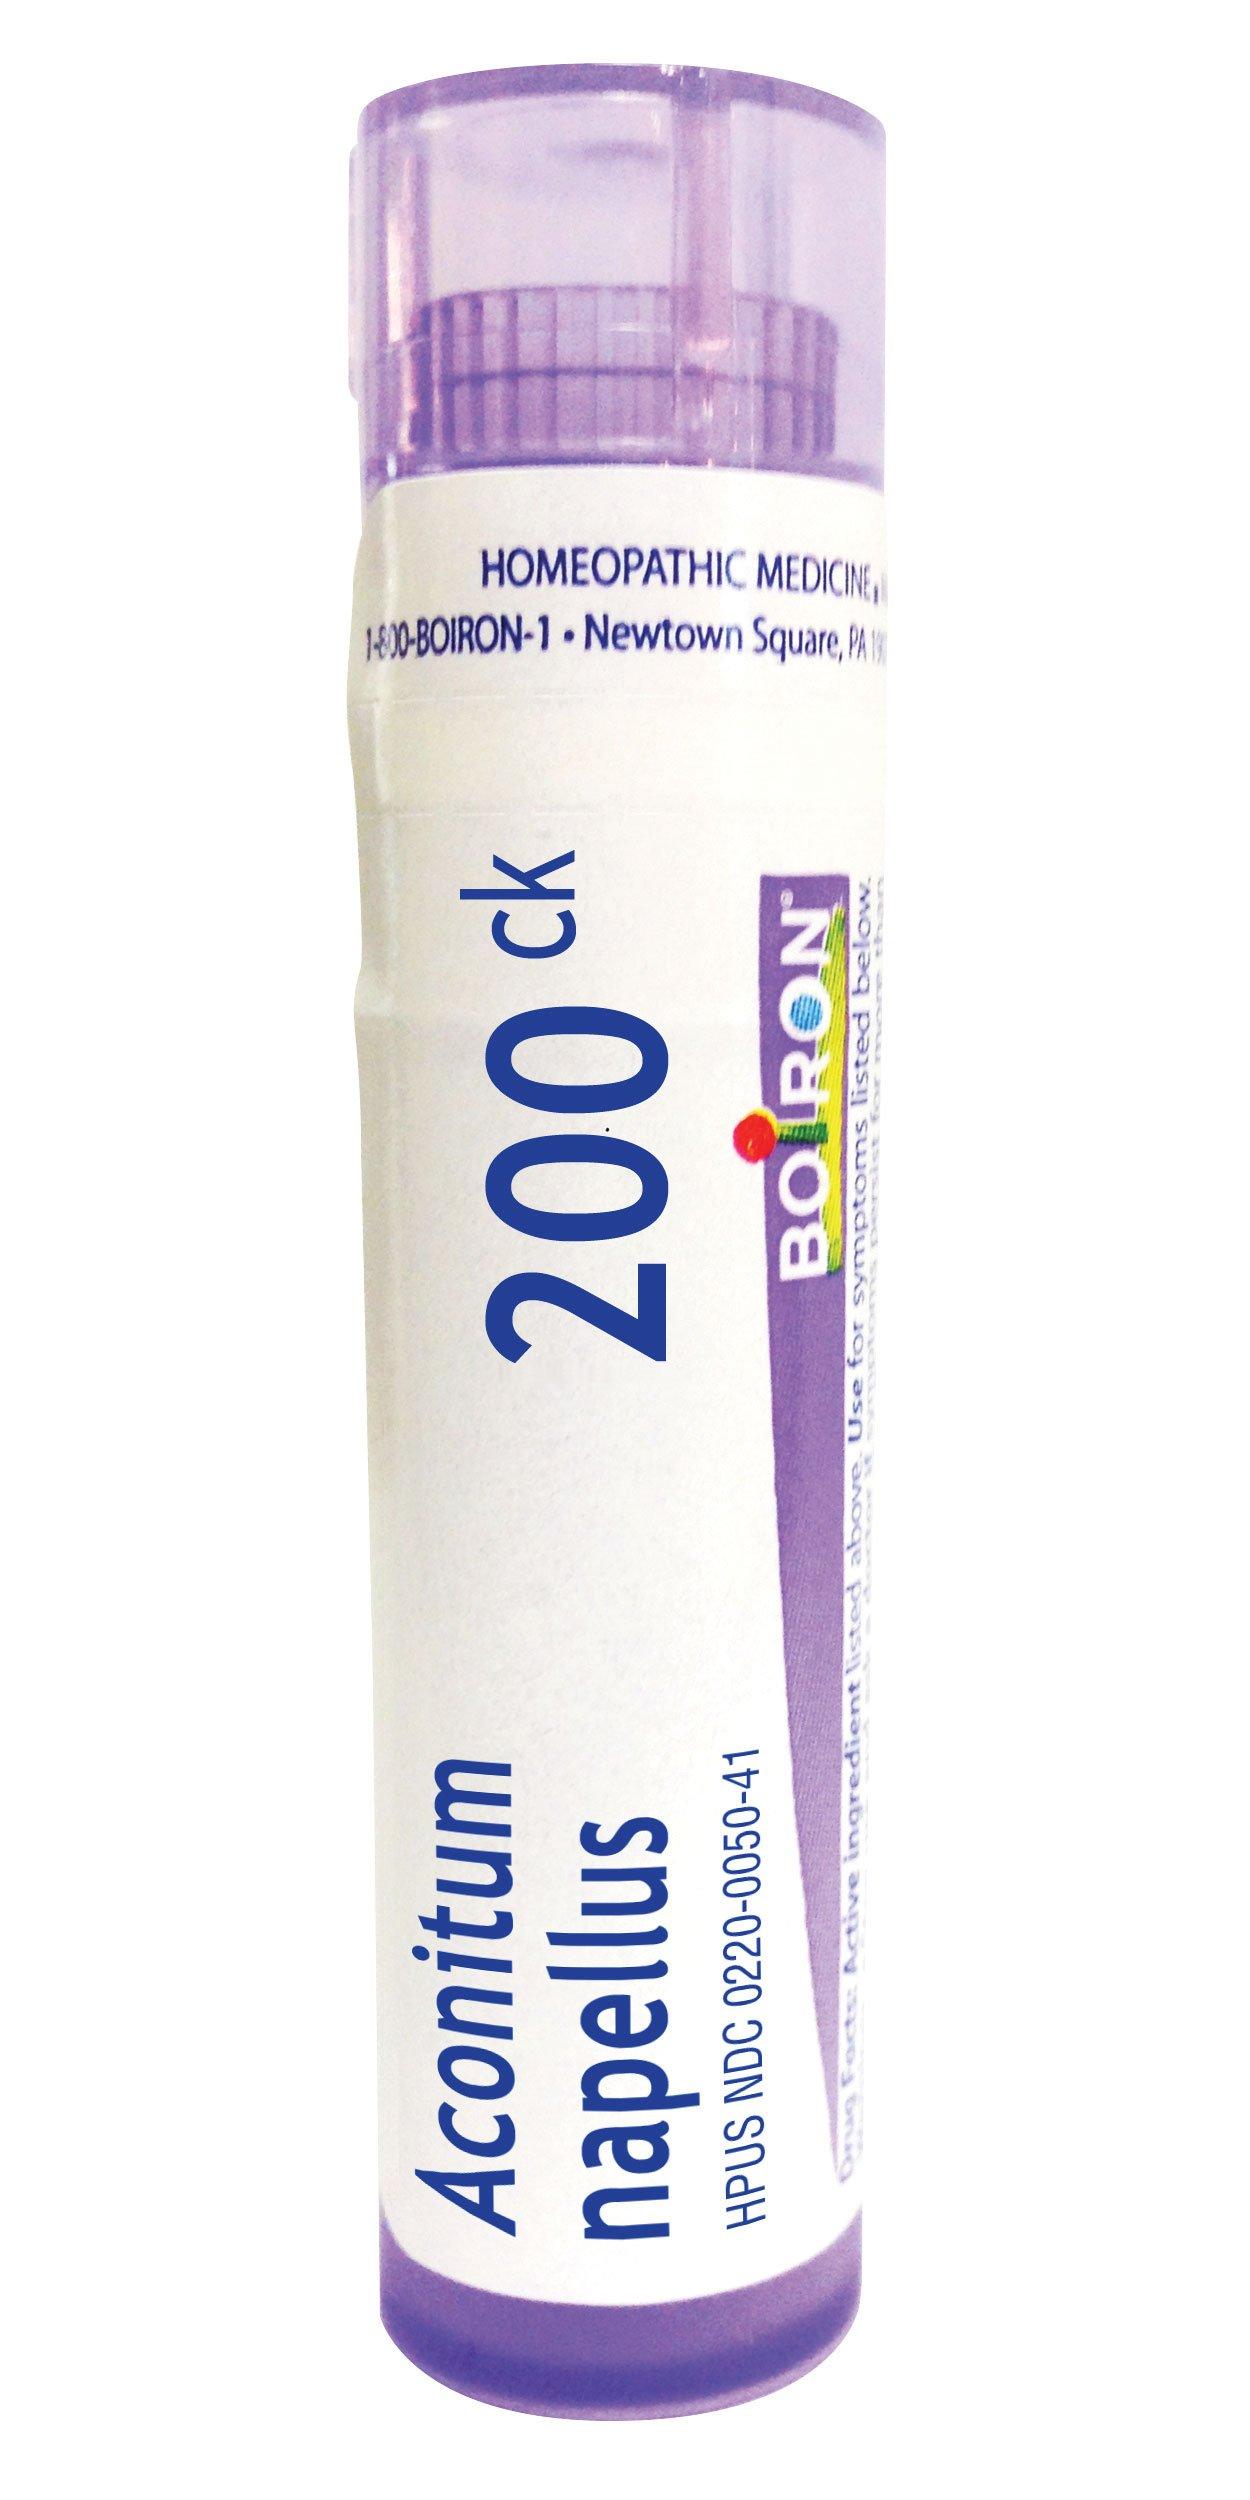 Boiron Aconitum Napellus 200C, 80 Pellets, Homeopathic Medicine for Fever